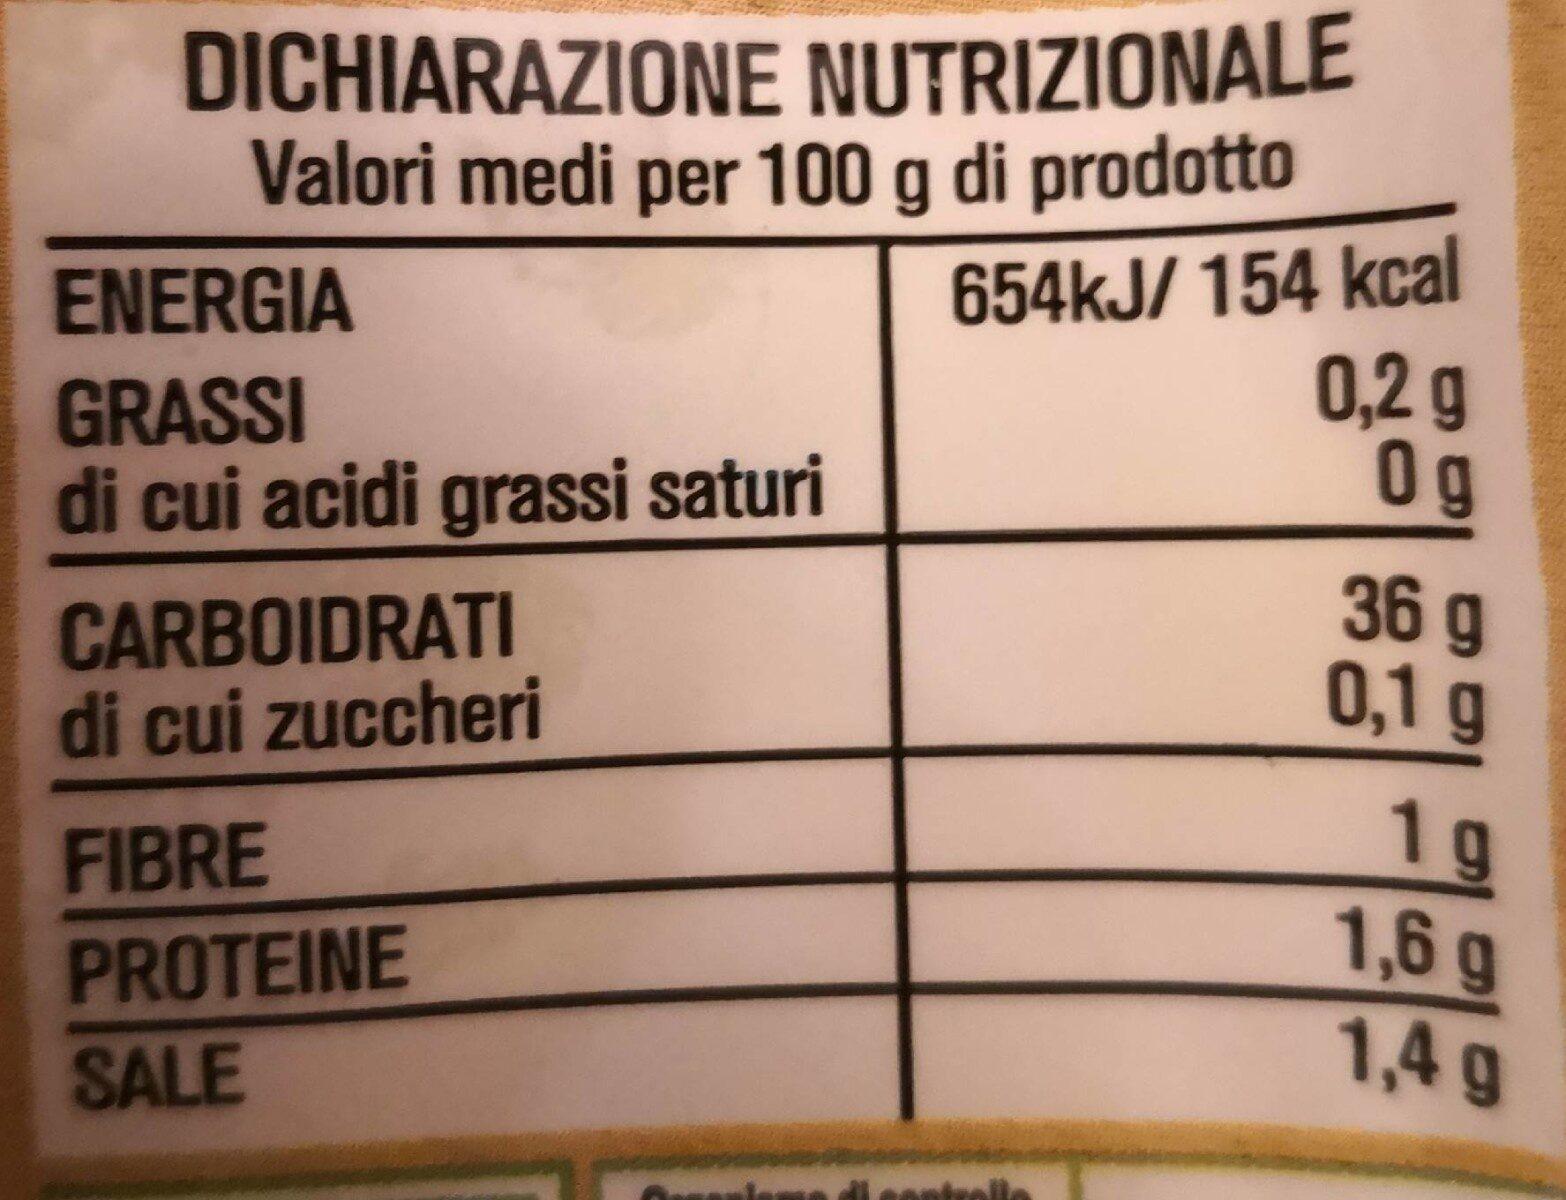 Gnocchi dIGPatate senza glutine biologici - Informations nutritionnelles - it